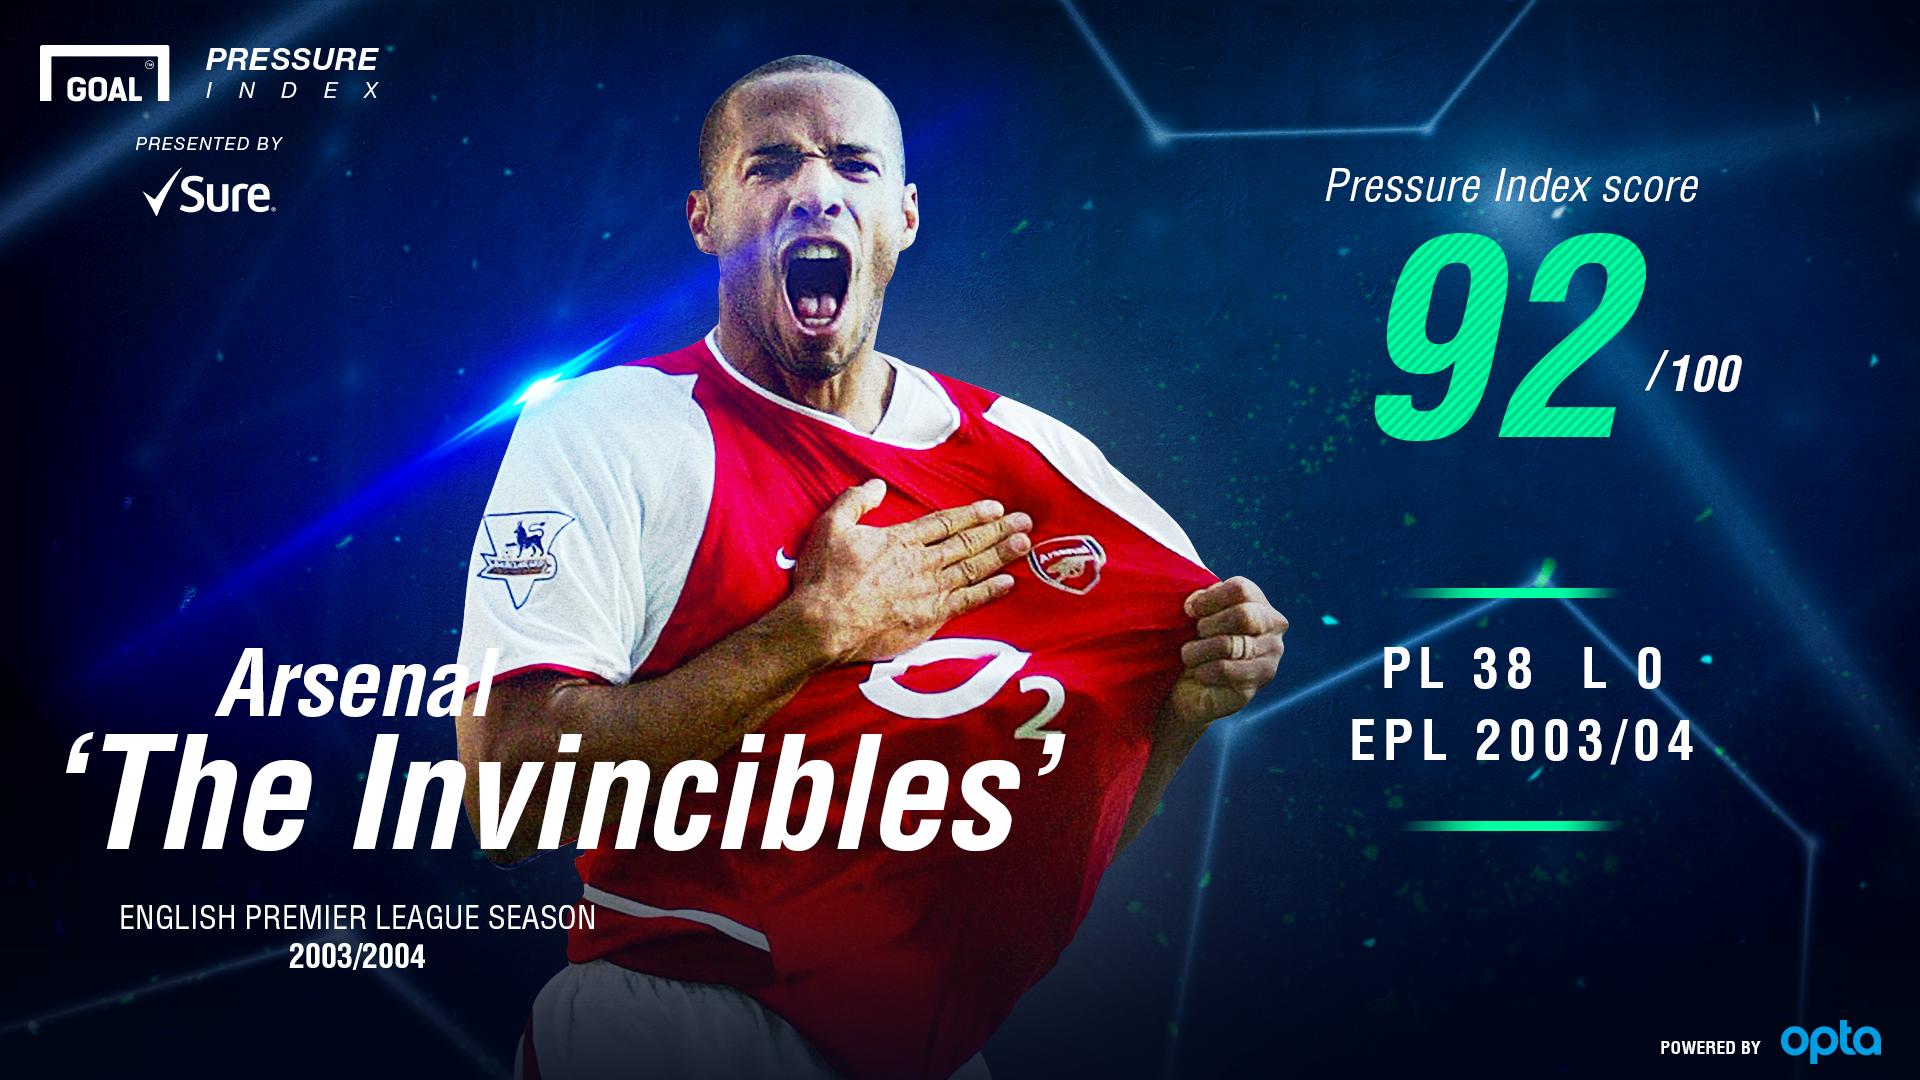 Arsenal Pressure Index